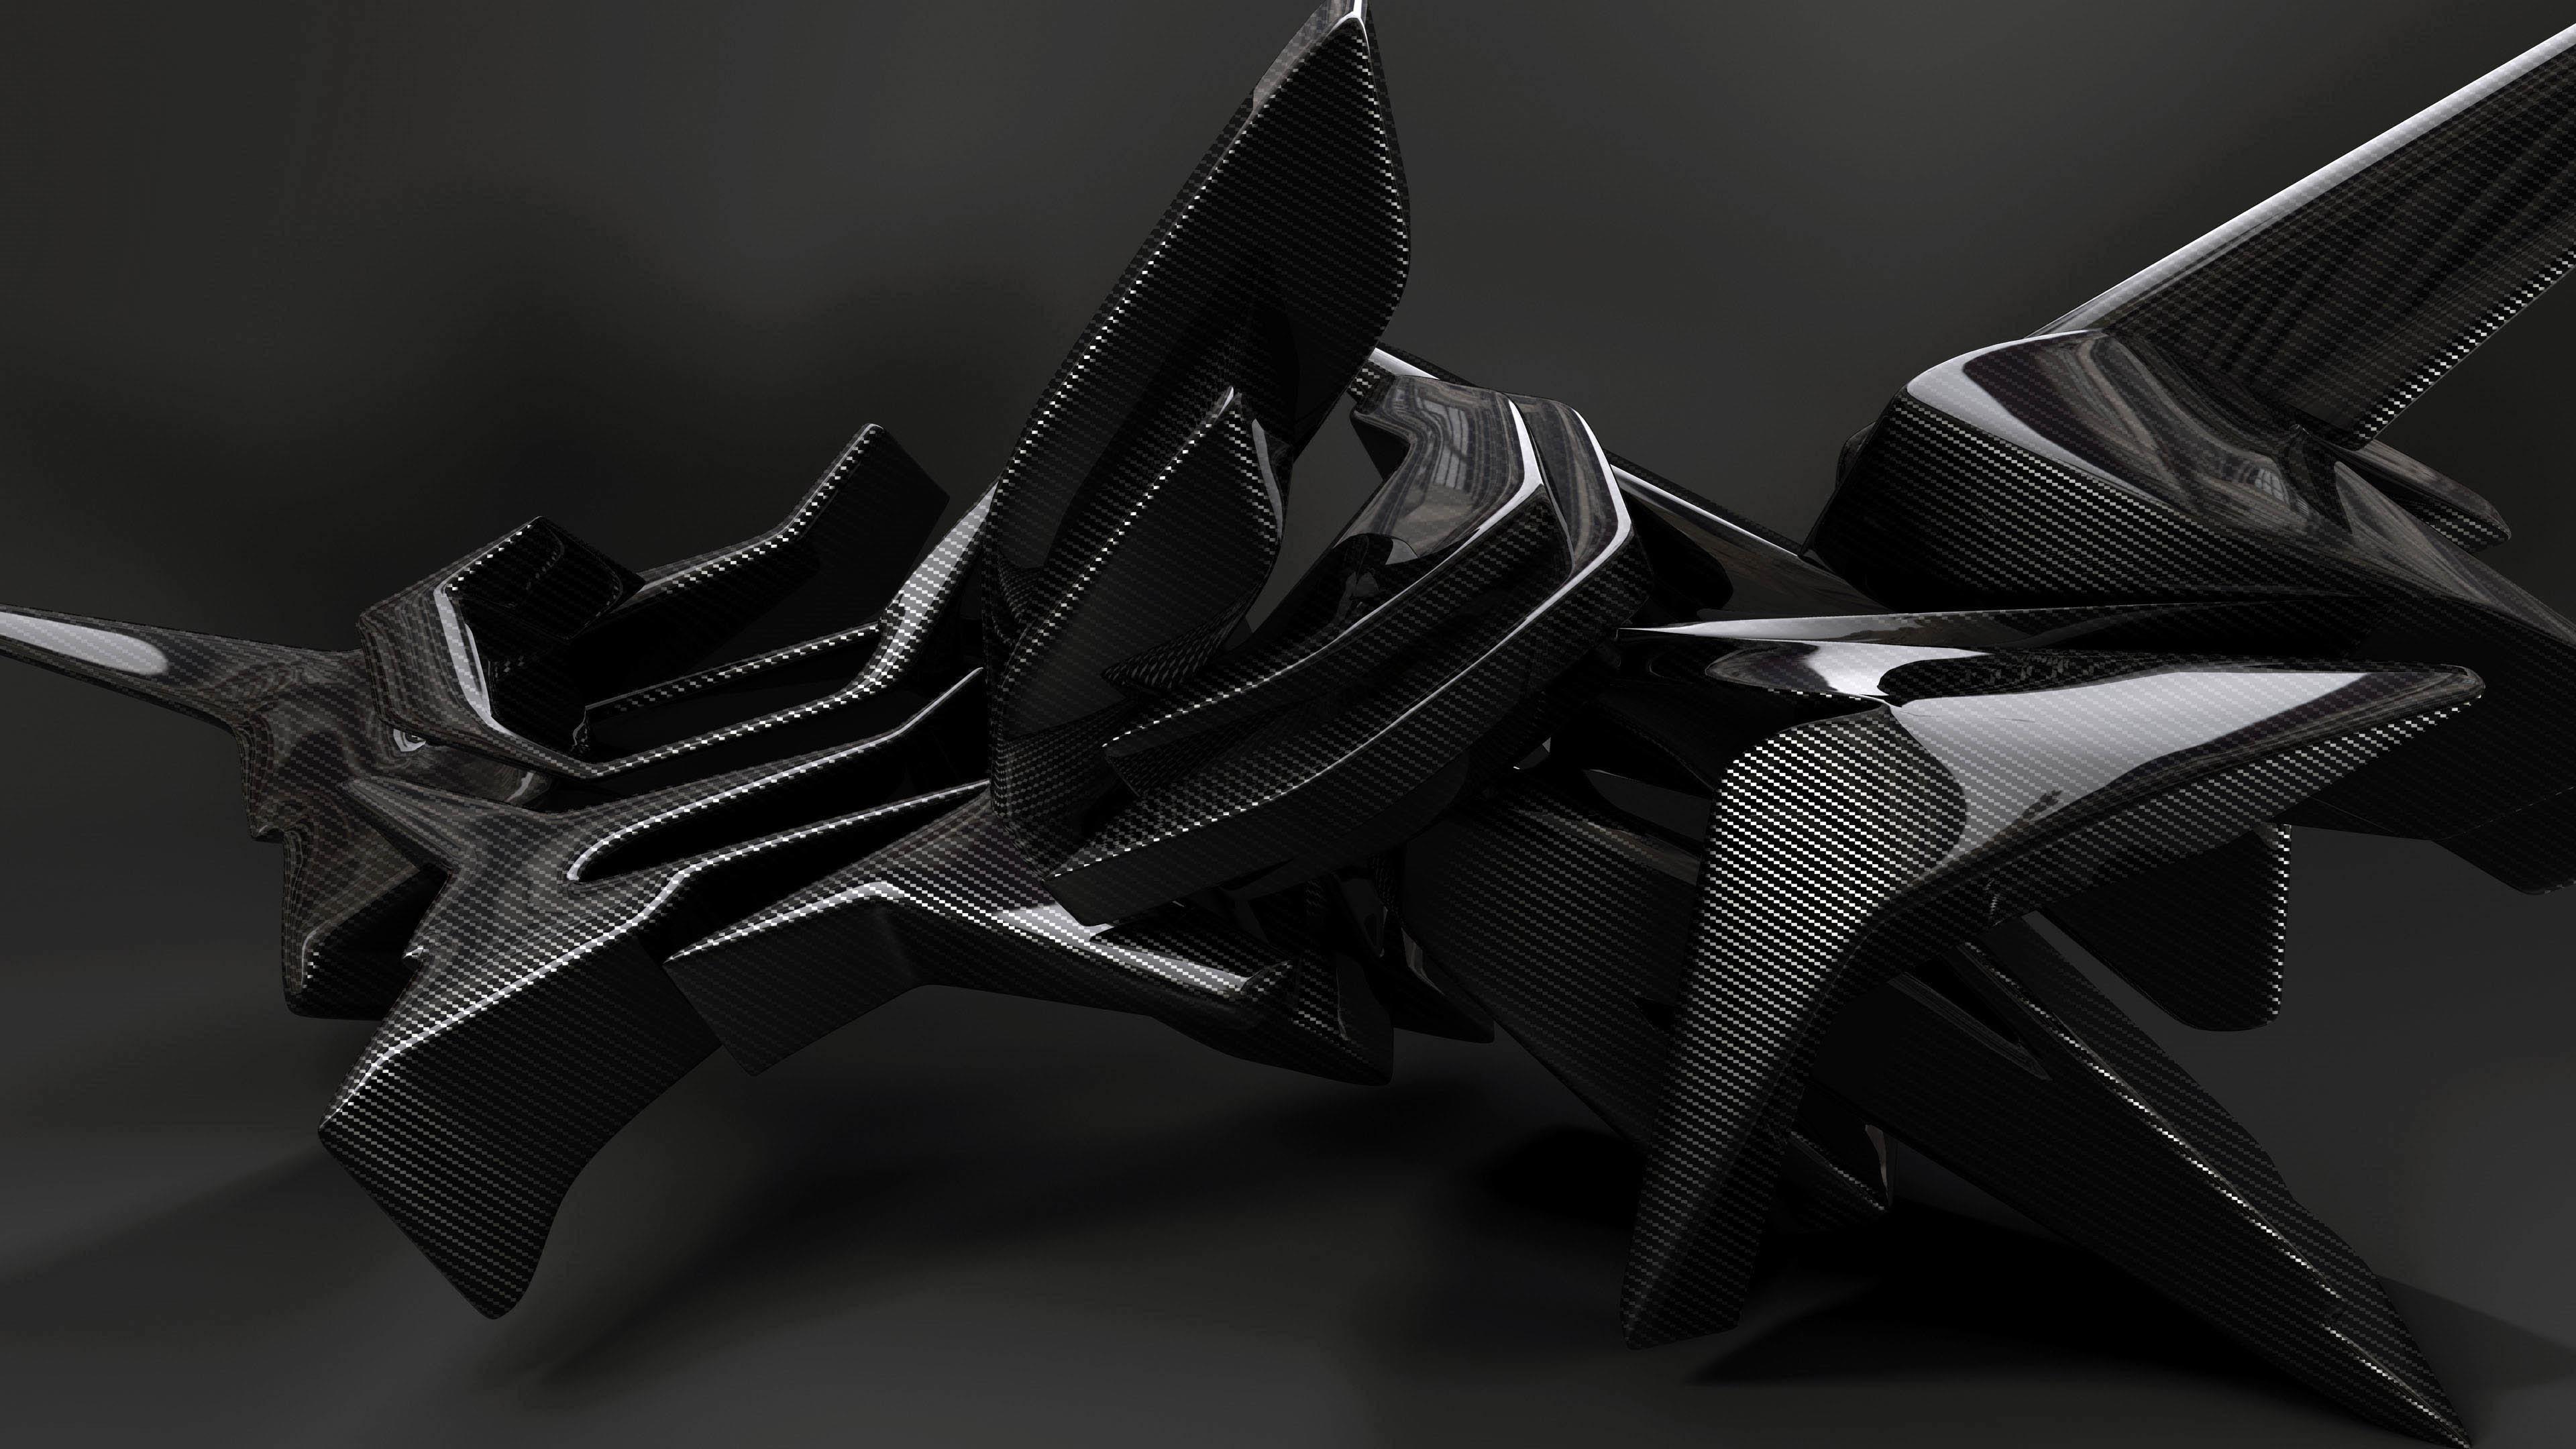 4K Carbon Fiber Wallpaper (71+ images)